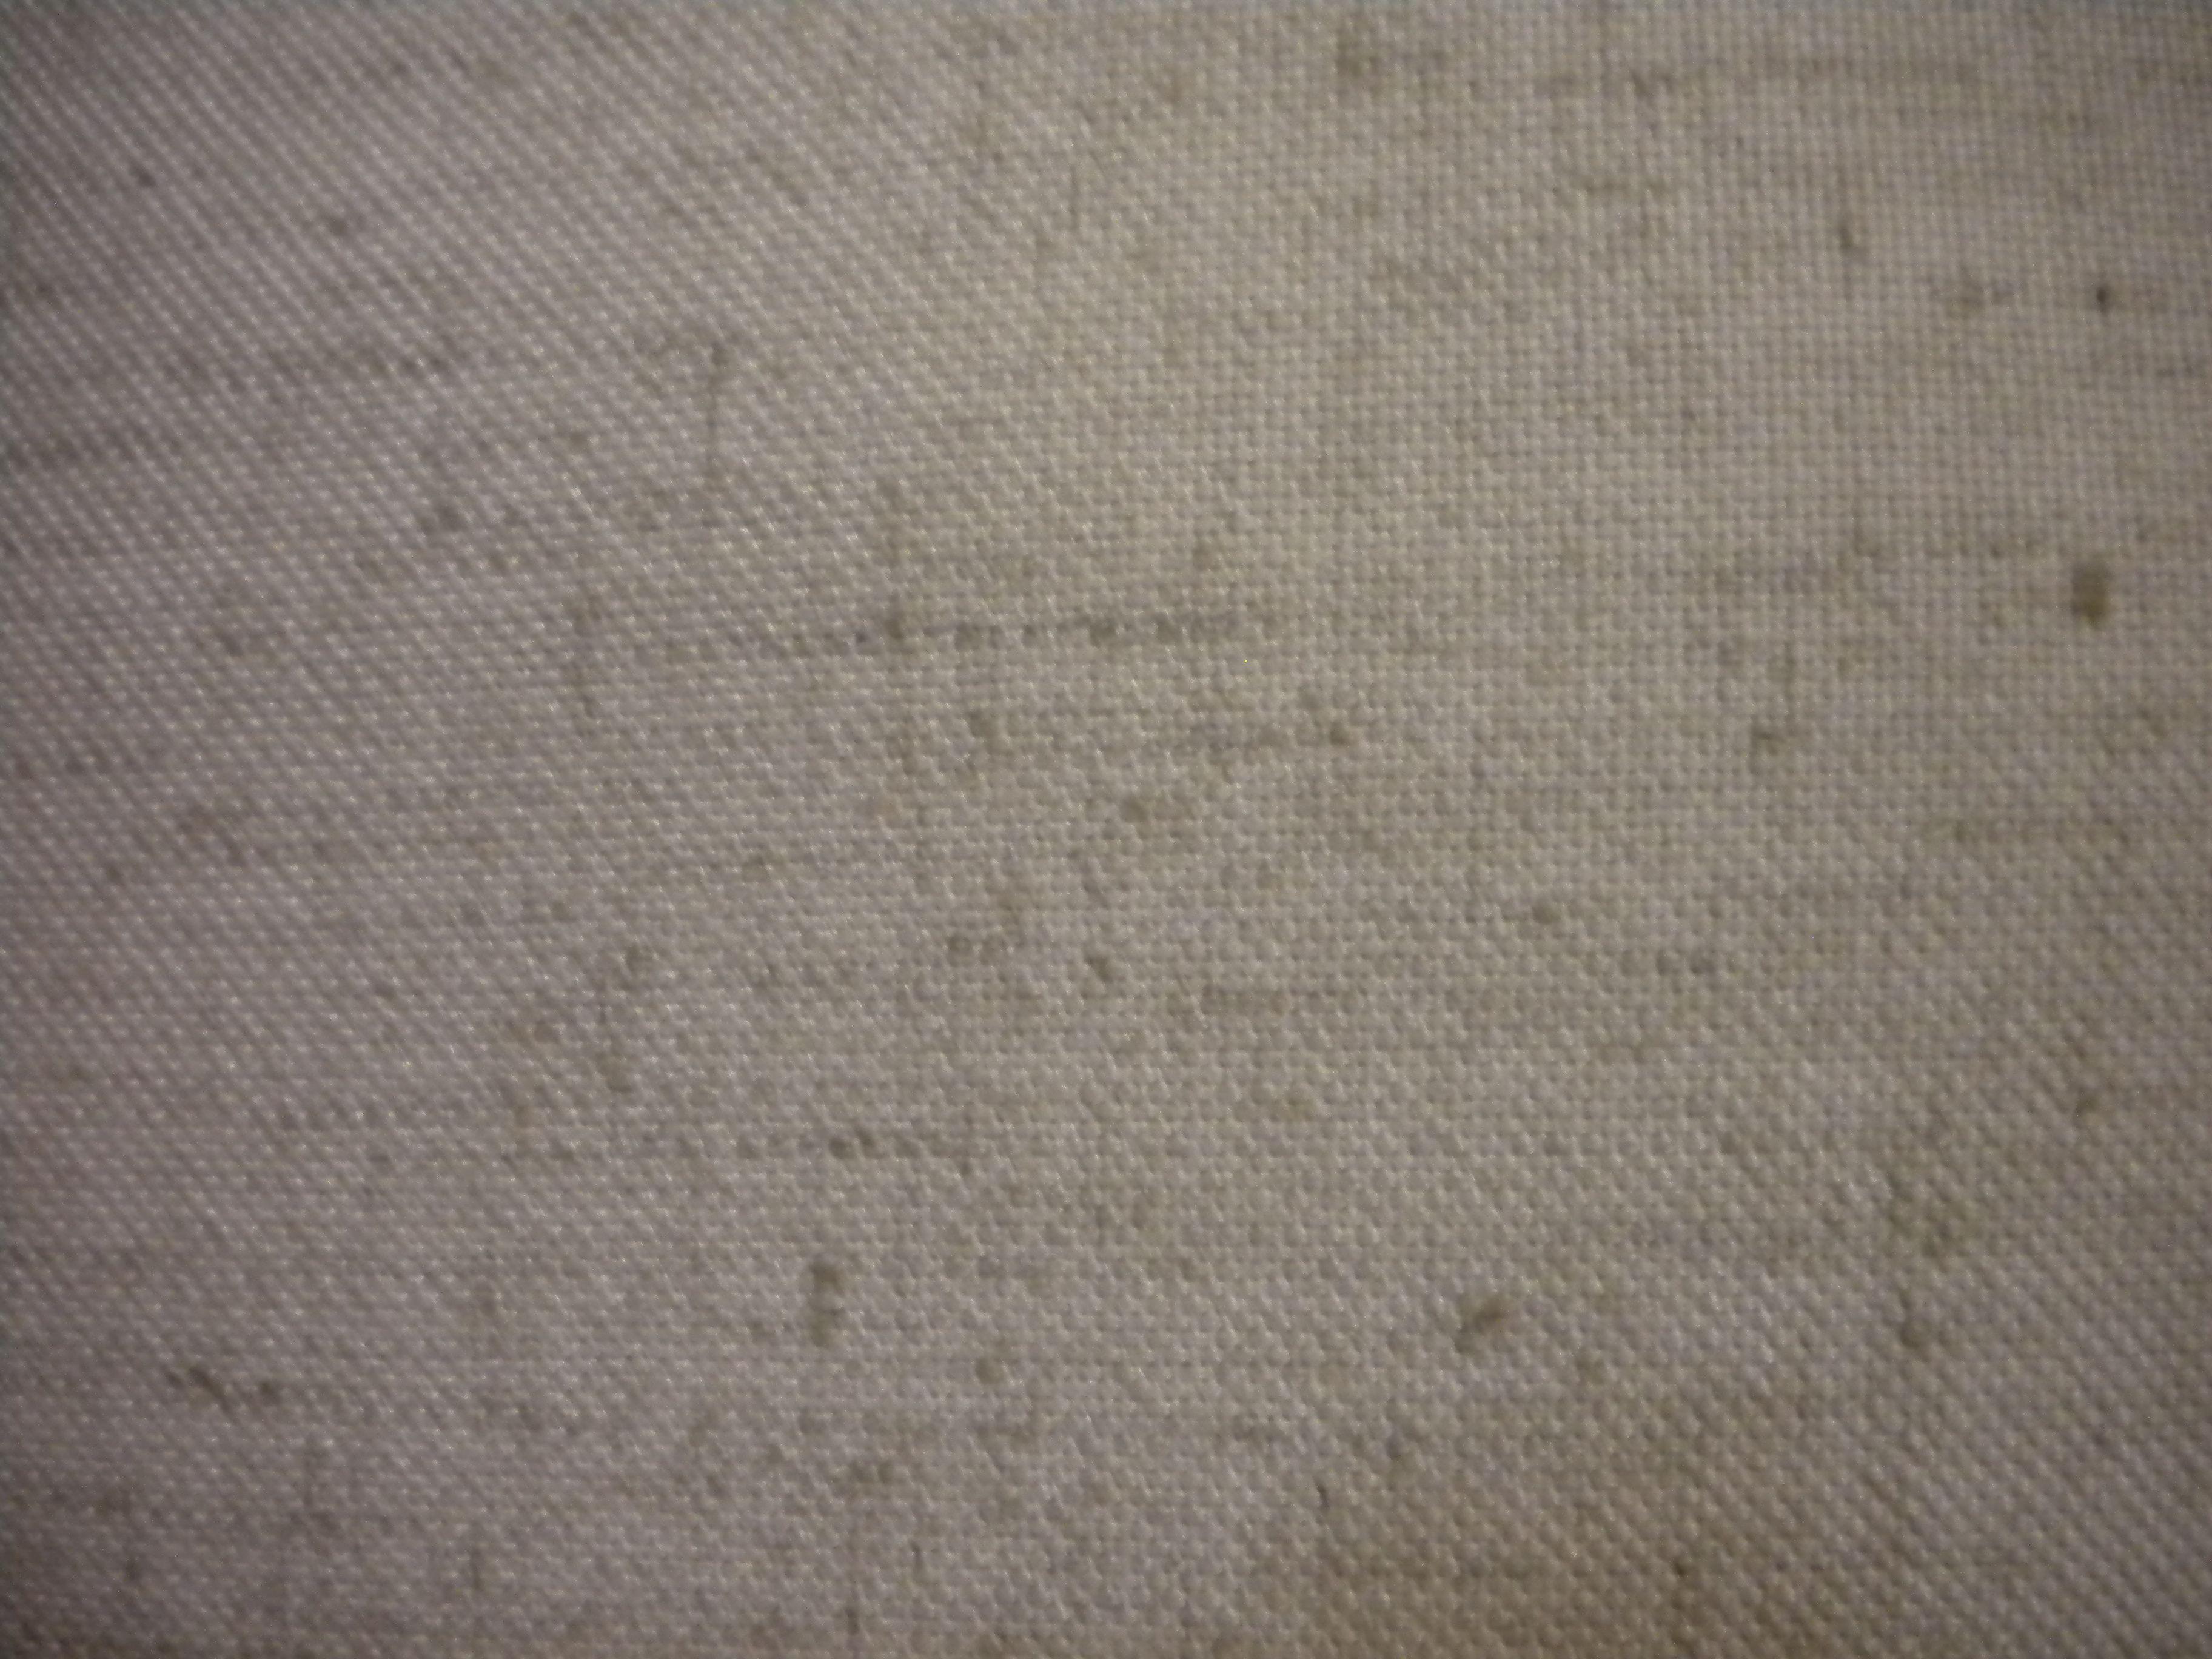 минимализм подушкиназаказ подушкисмужскимхарактером съемныенаволочки мужскойинтерьер декоративныеподушки ручнаяработа